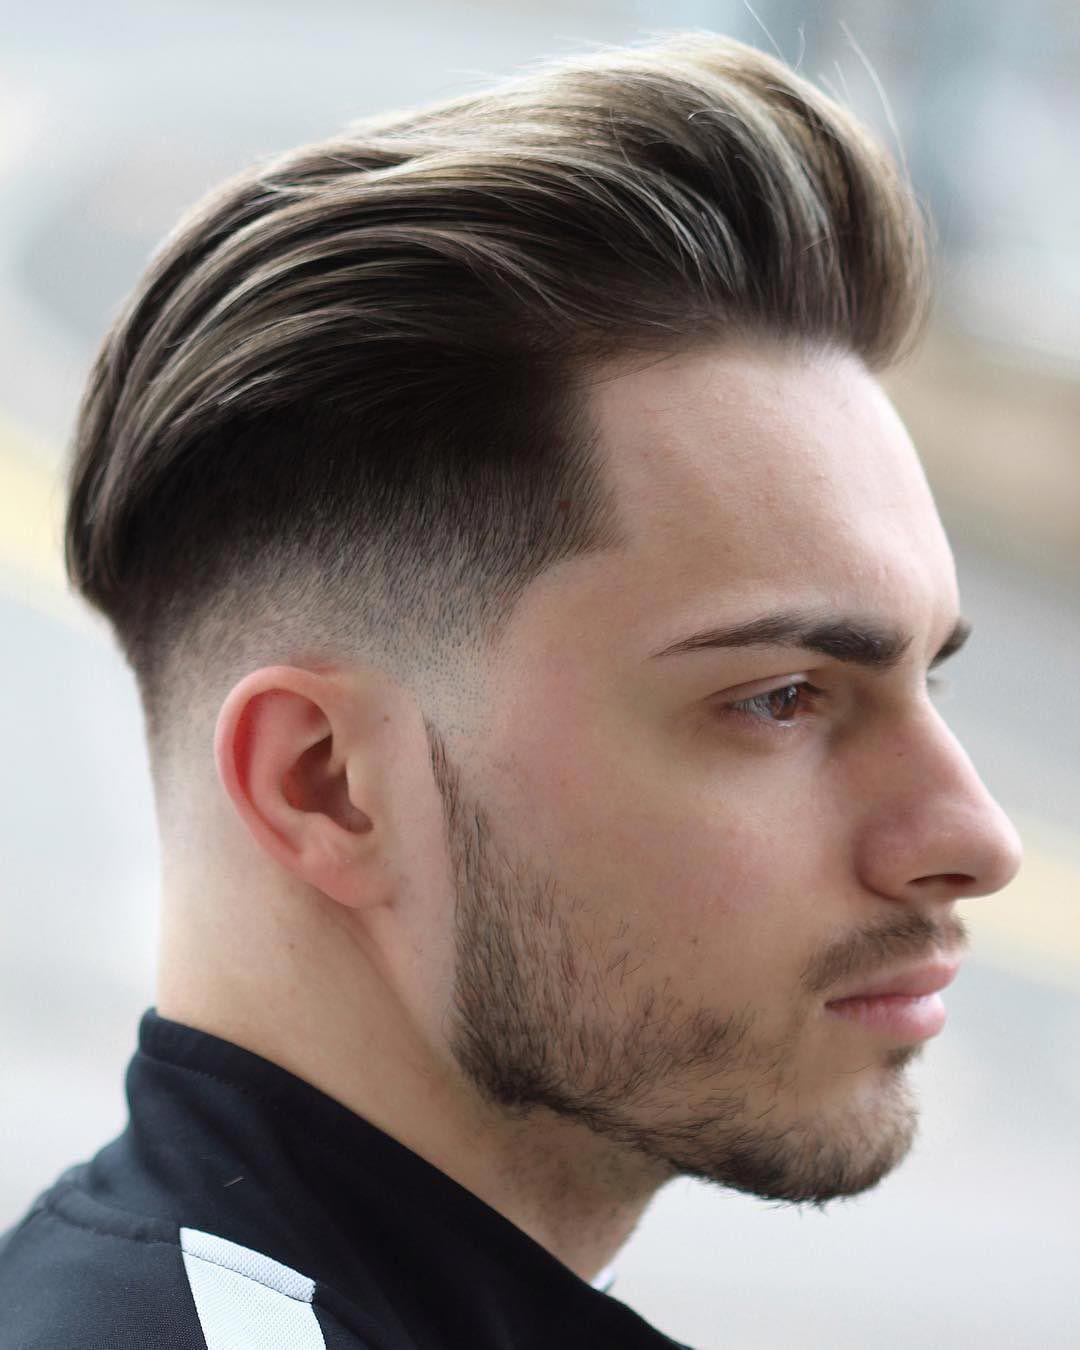 Undercut Mannerfrisuren Kurz Langeres Deckhaar Bart Herrenfrisuren Haarschnitt Manner Haarschnitt